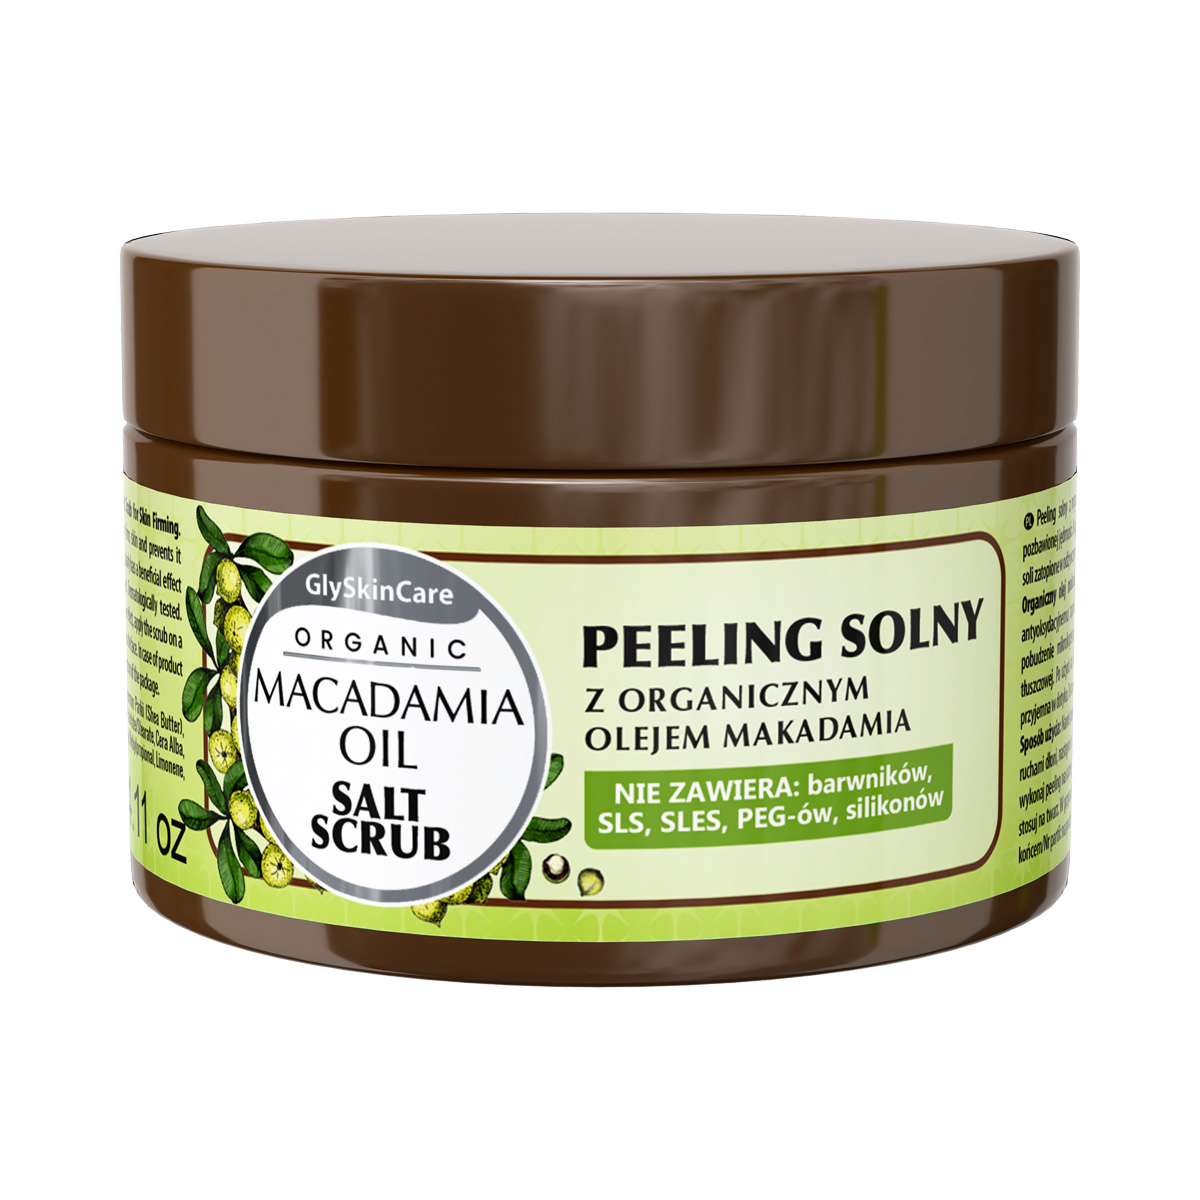 Biotter Solný peeling s organickým makadamovým olejem 400 ml